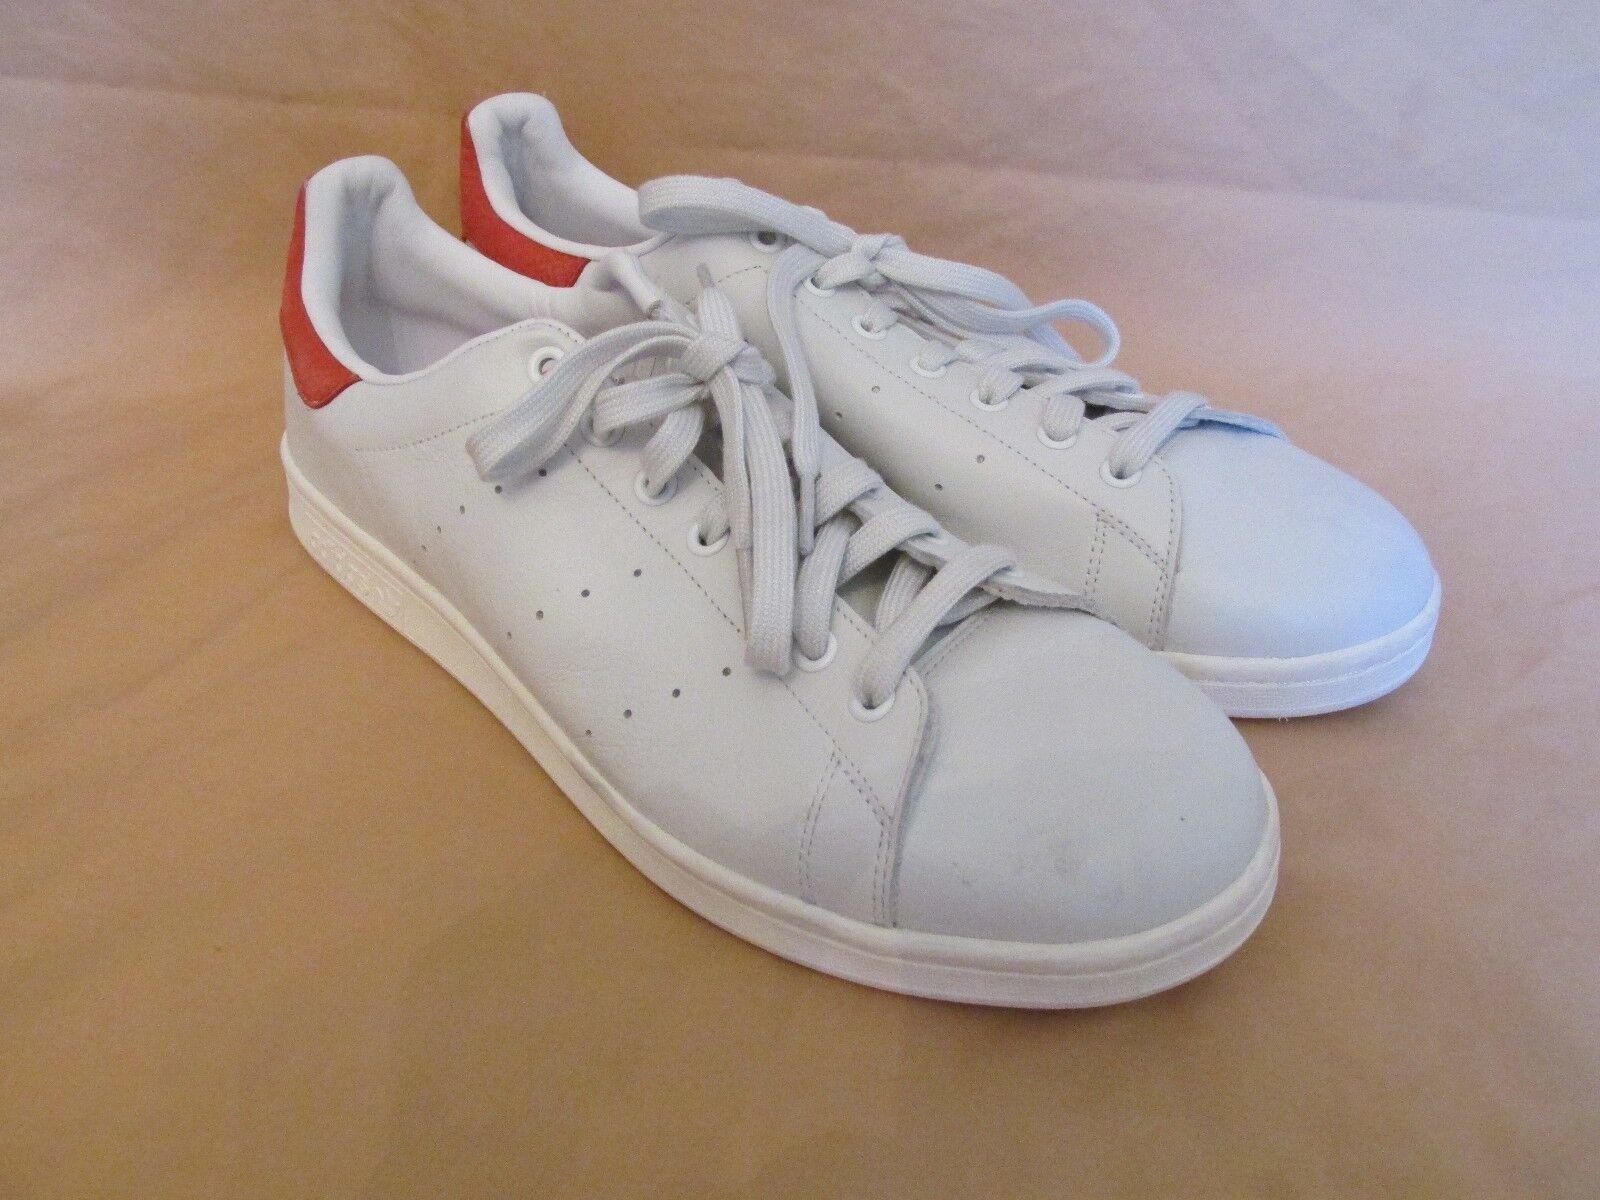 Neu Herren Adidas Original Stan Smith Og Weiß Rot Leder Turnschuhe 13.5 D67363    | Optimaler Preis